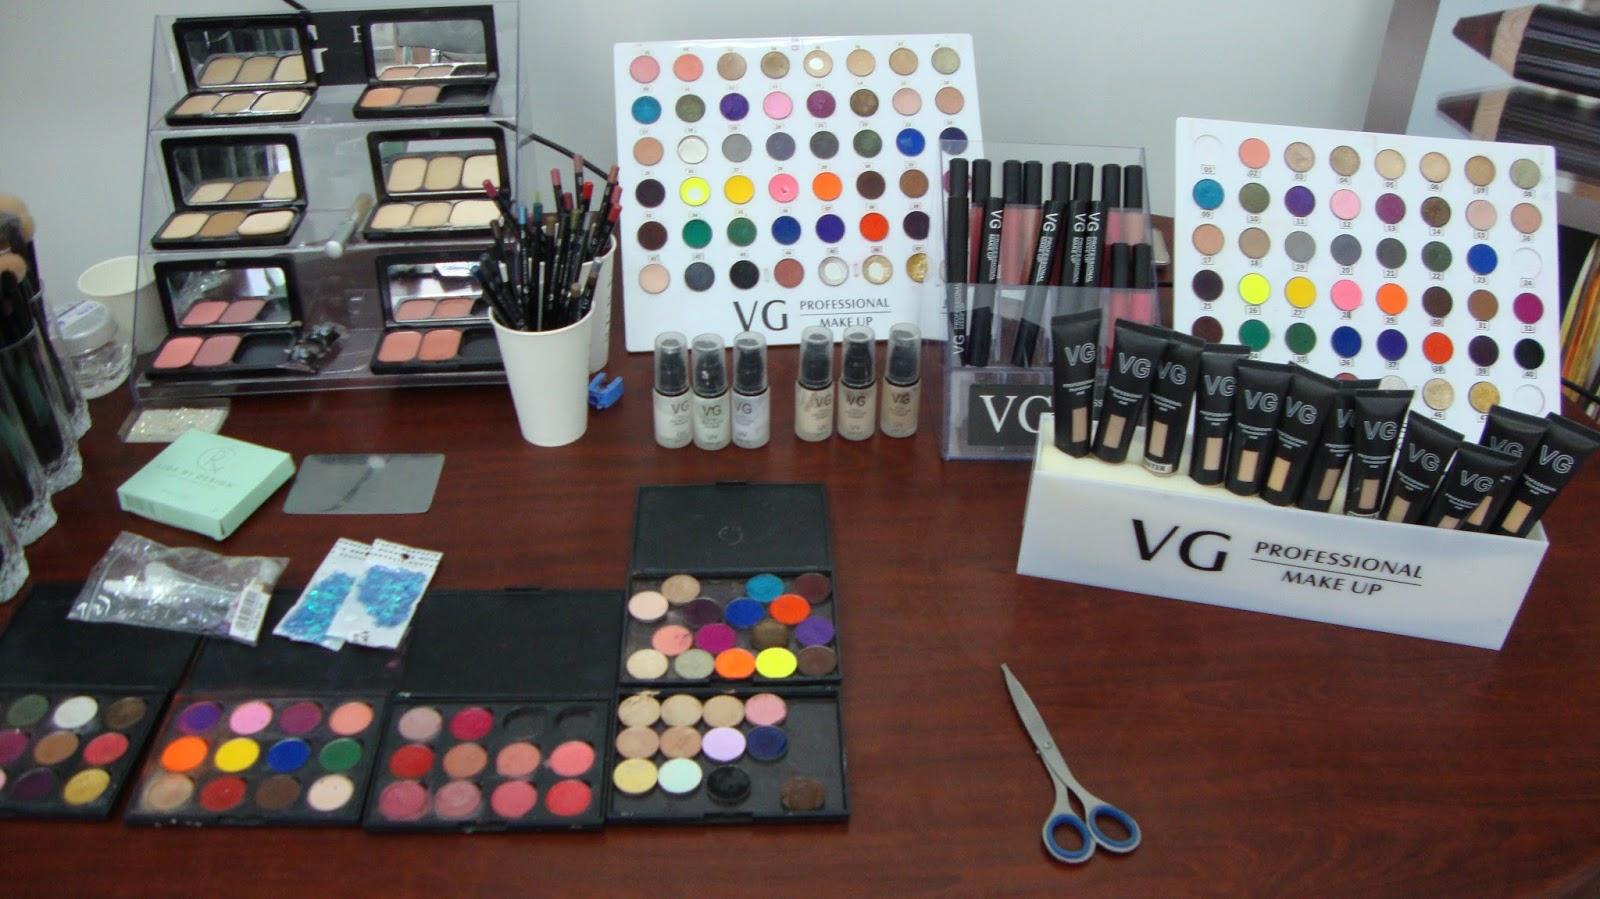 Vg косметика официальный сайт